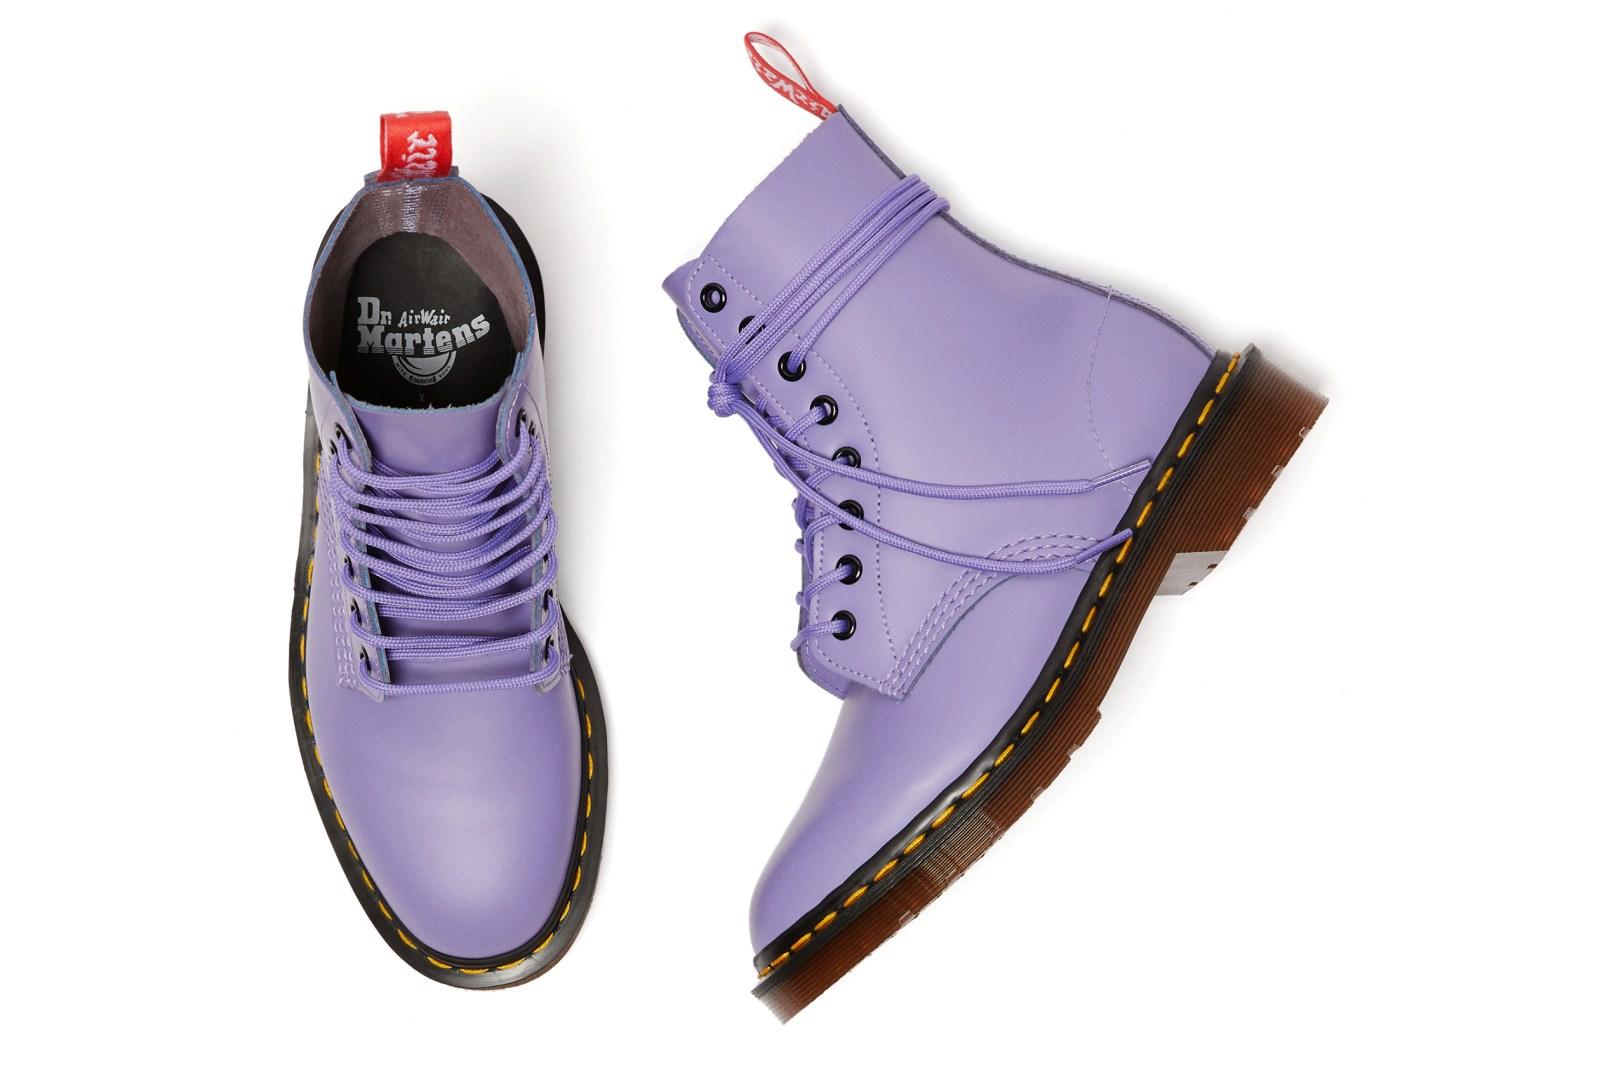 UNDERCOVER x Dr. Martens 全新聯乘 1460 靴款系列登場